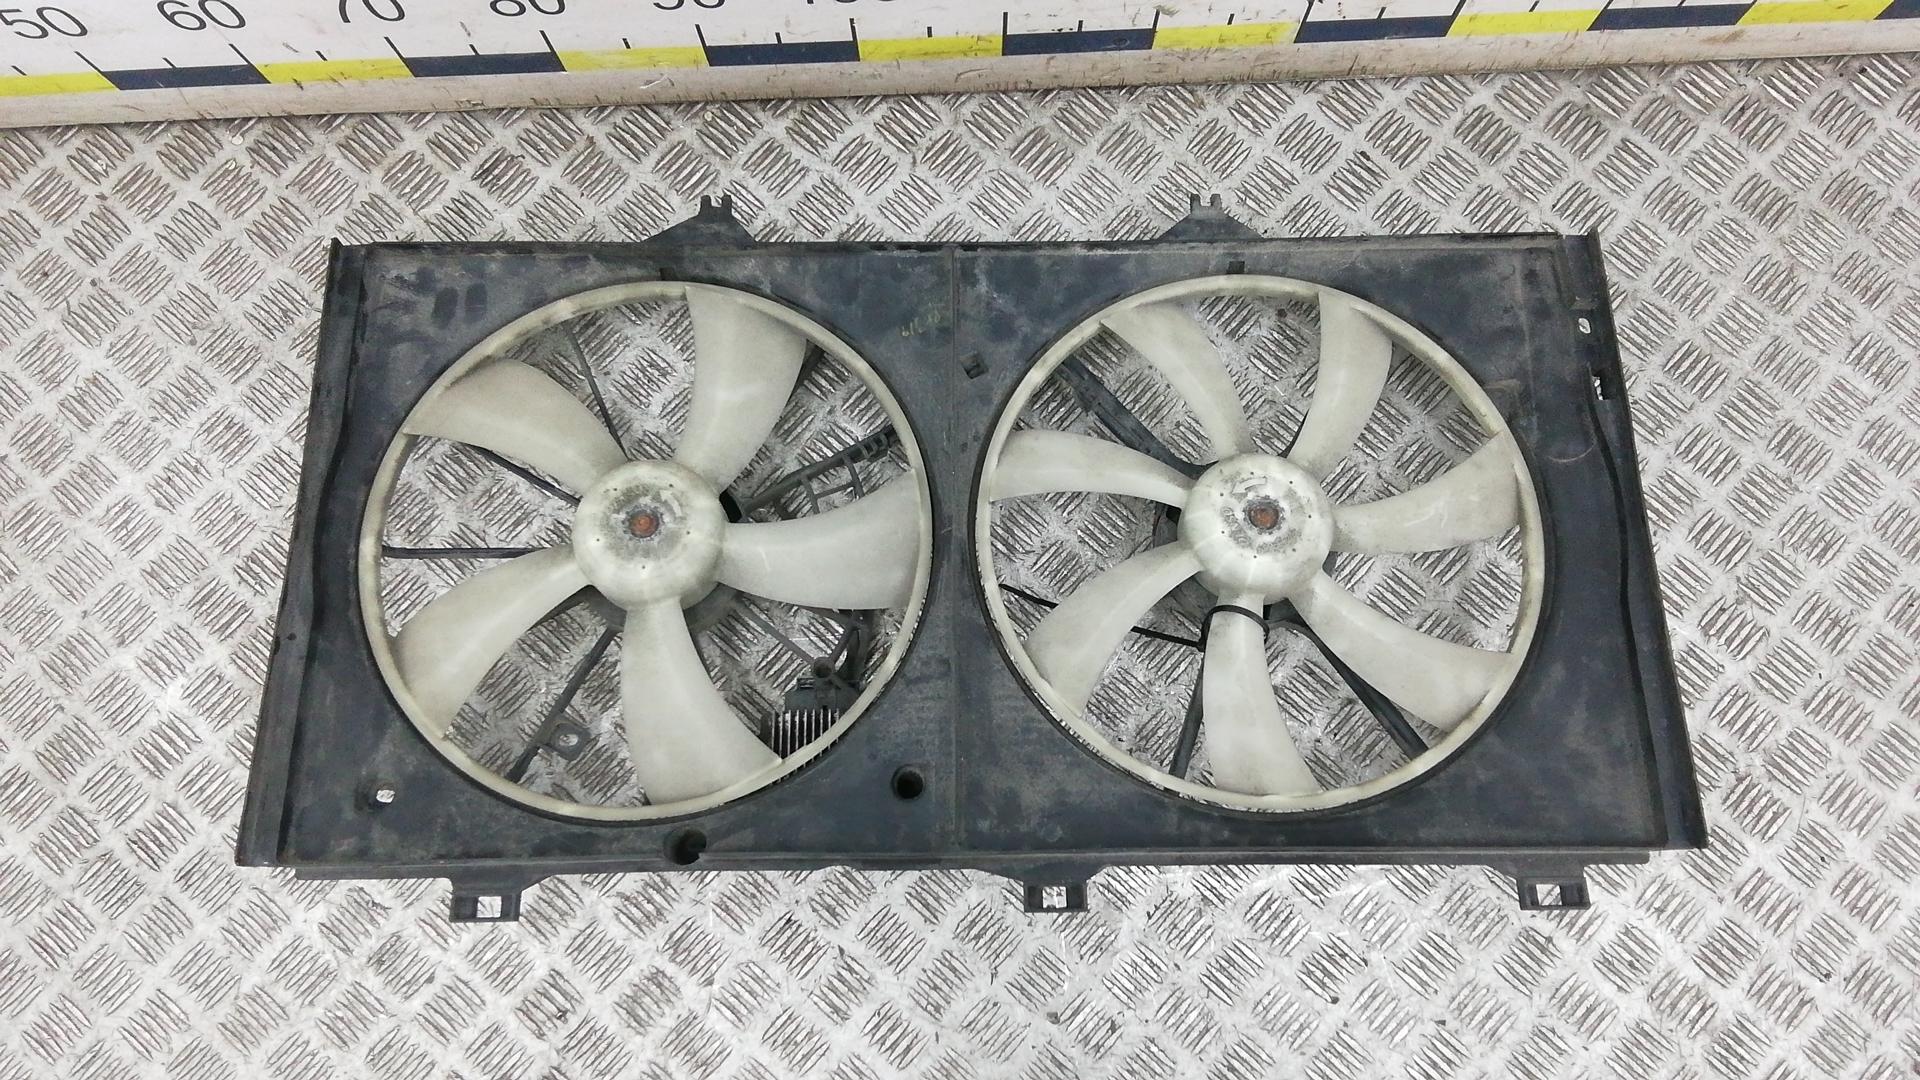 Вентилятор радиатора, TOYOTA, CAMRY V4, 2009